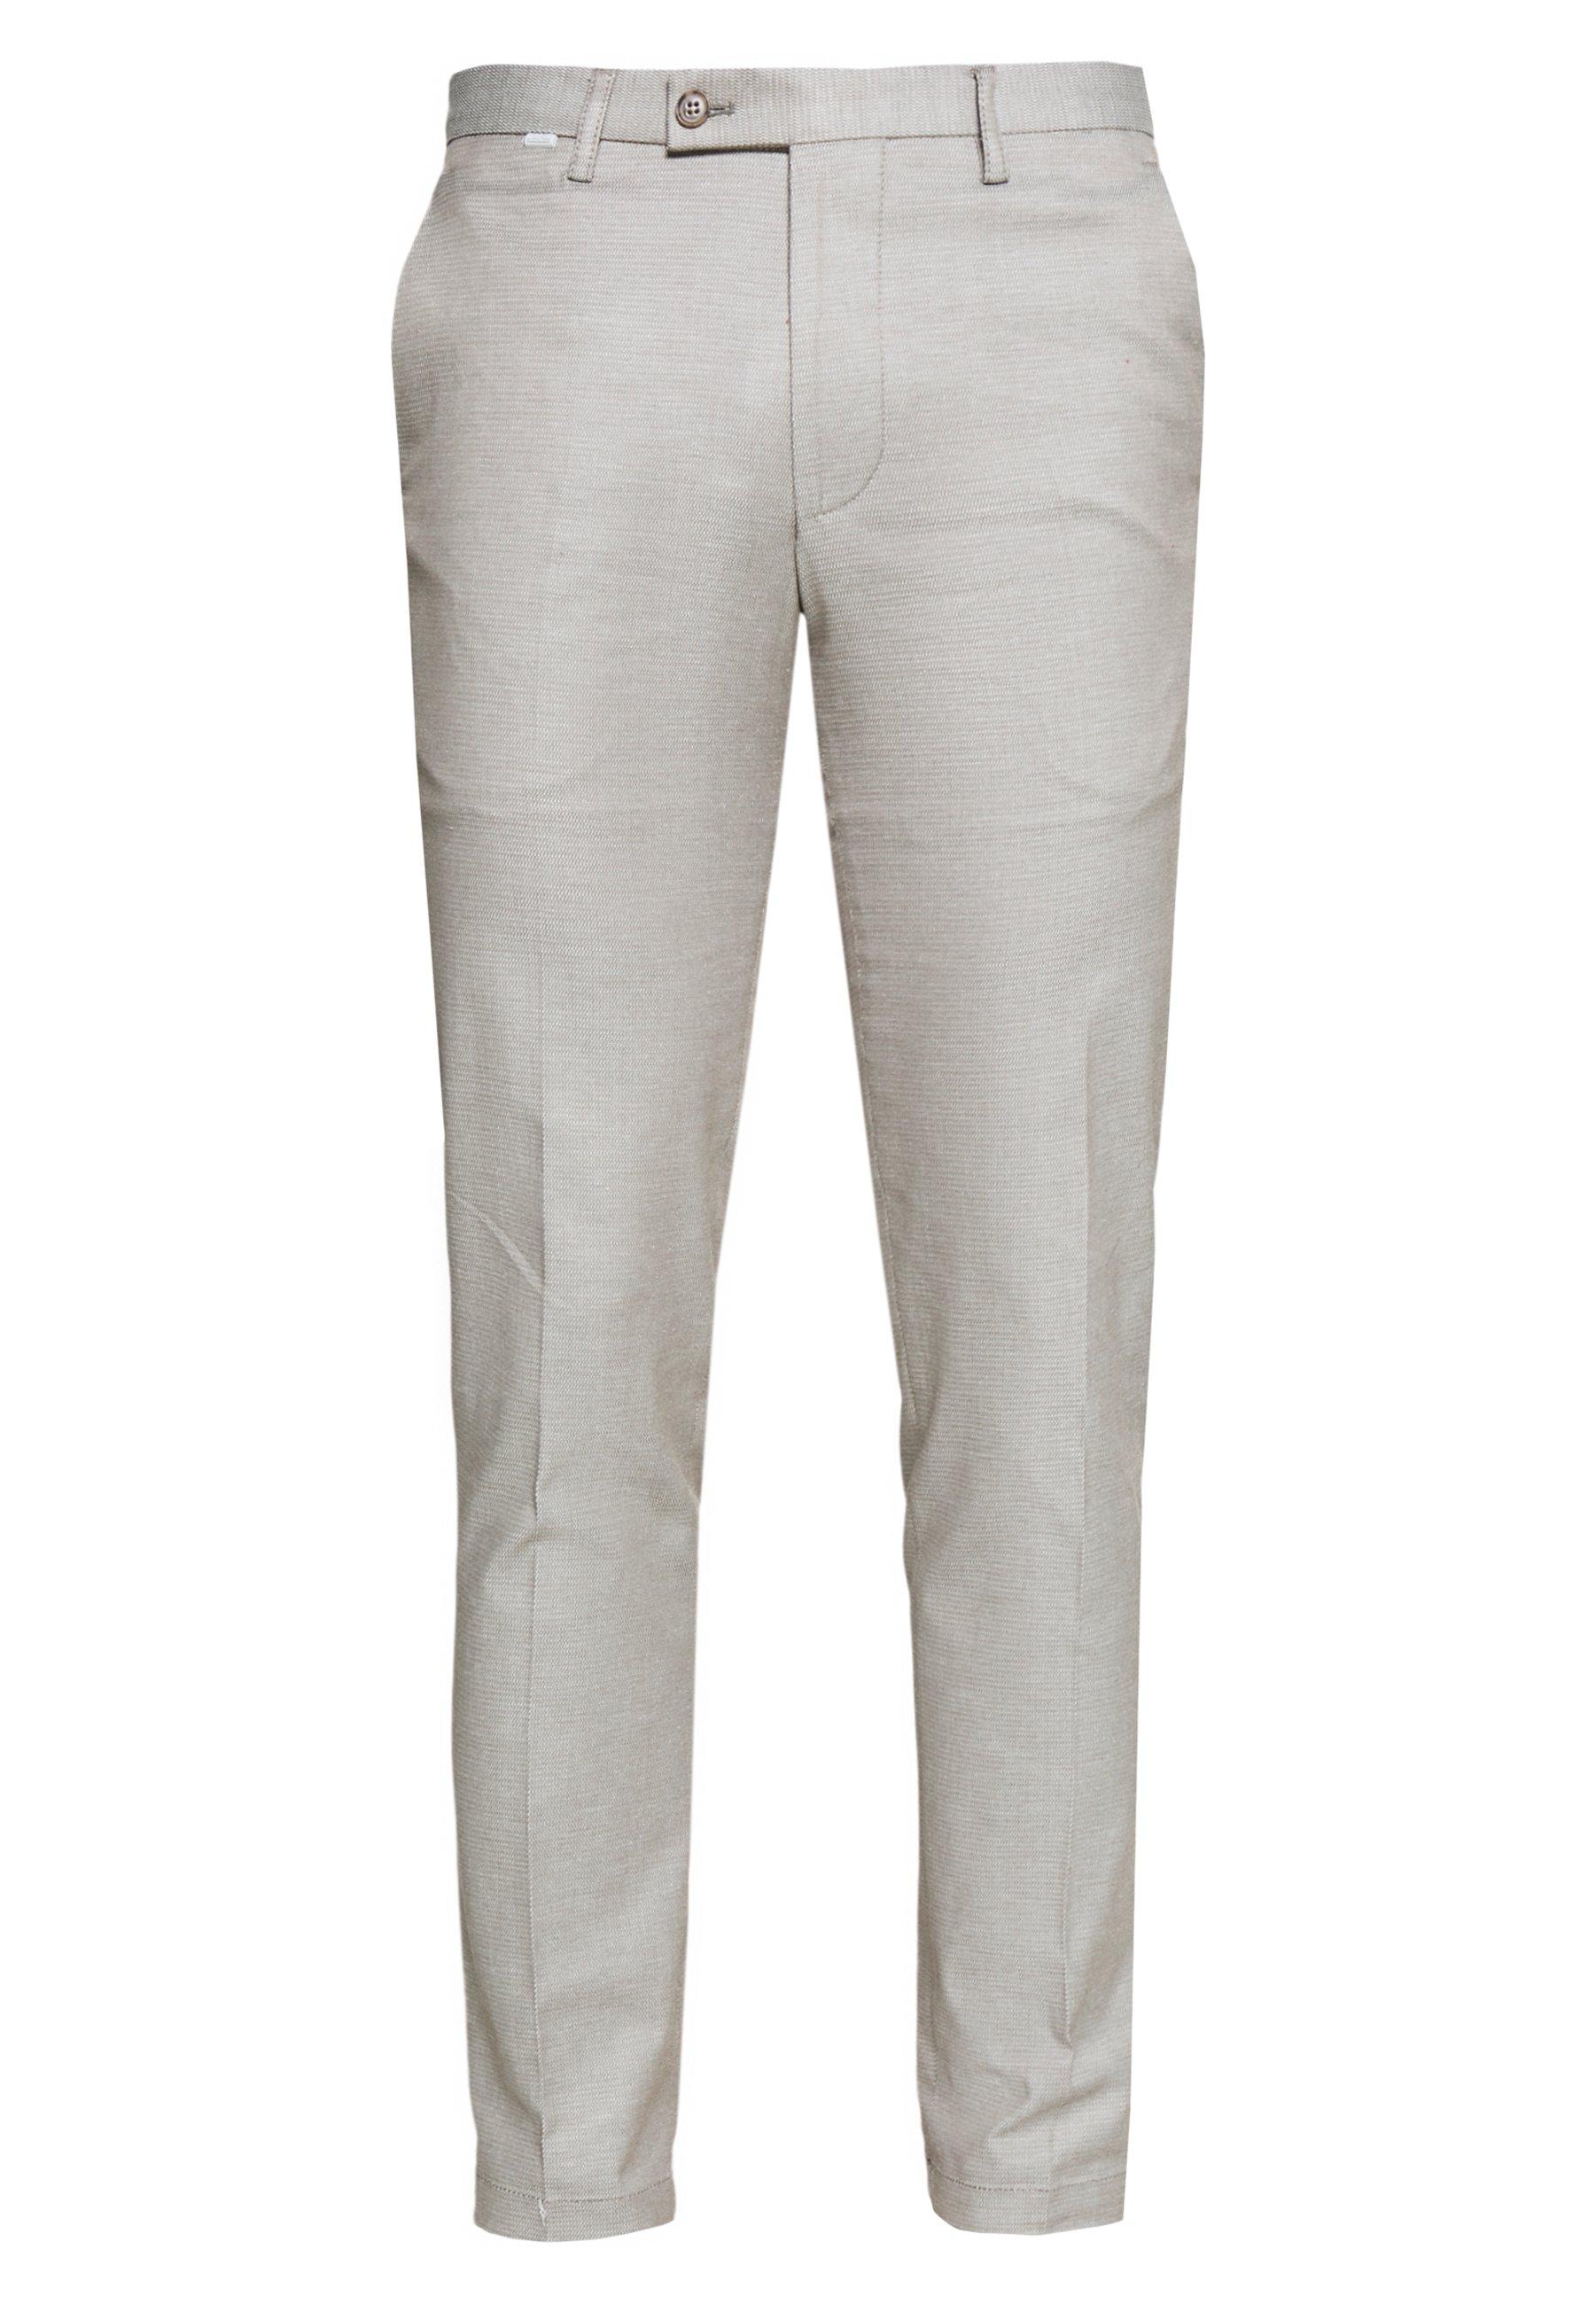 Cinque CIBRAVO TROUSERS - Pantalon classique - grey